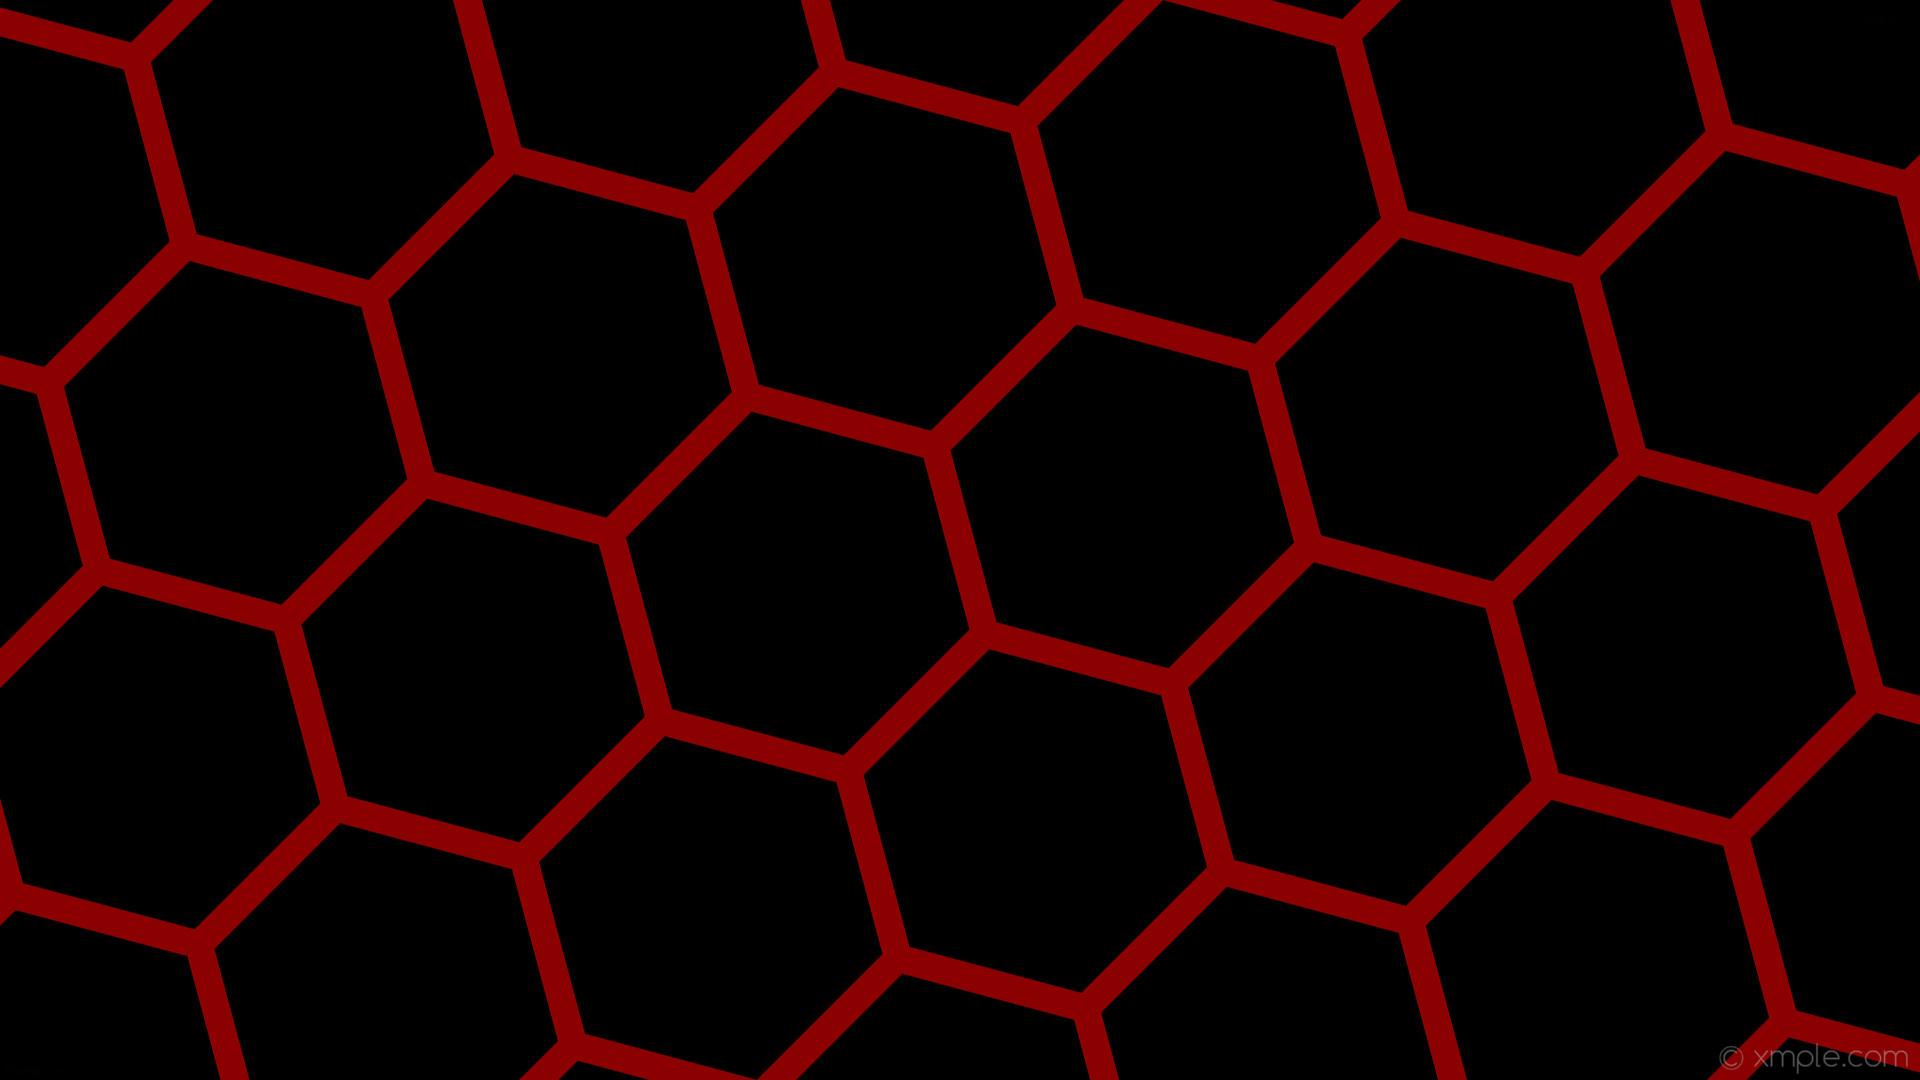 wallpaper beehive red black hexagon honeycomb dark red #000000 #8b0000  diagonal 15° 28px